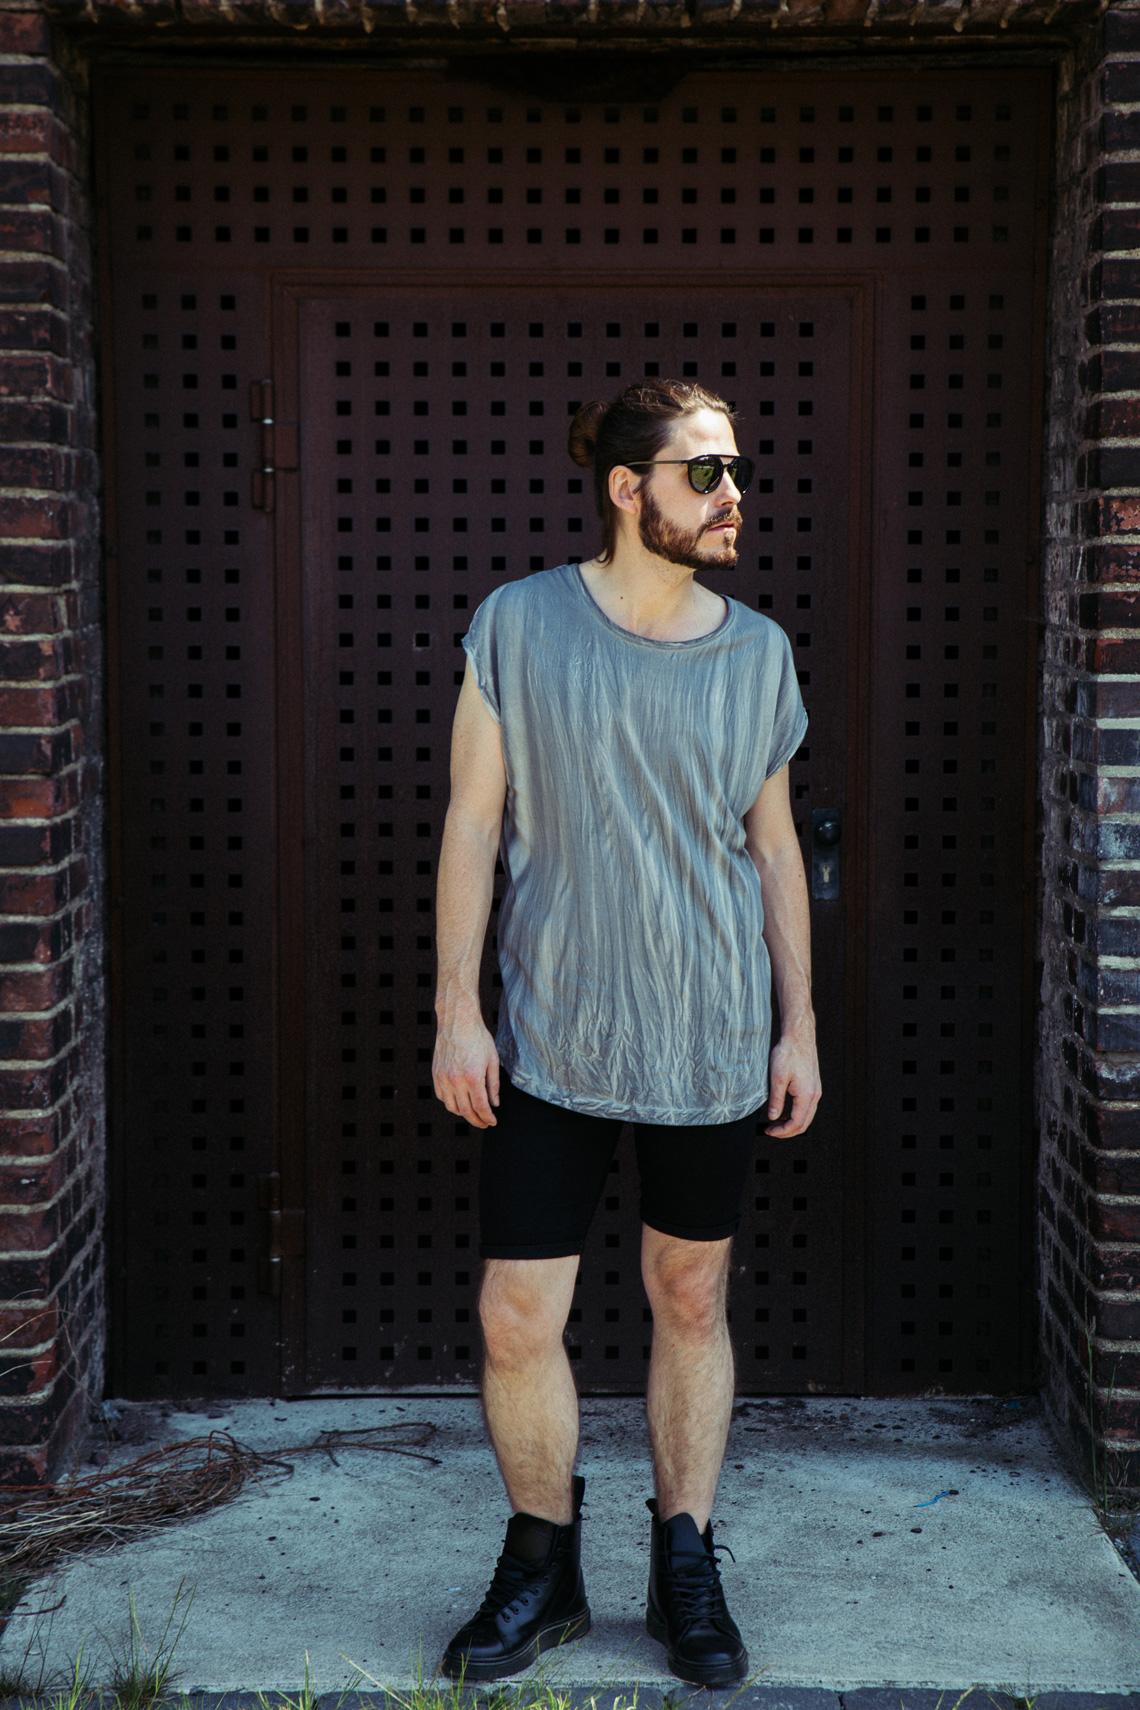 Kaisers-neue-kleider_Maennermodeblog_Male-Fashion-Style-Blog_Grunge-Outfit_Jeansshort_Docs_Fruehlingslook-Rockstar-Attitude_03